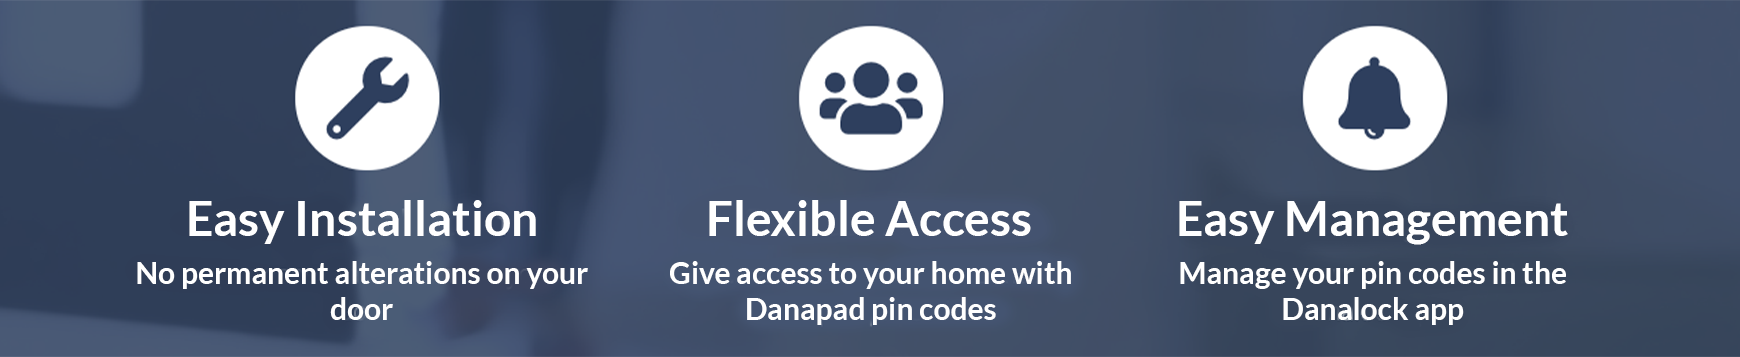 danalock-danapad-features-banner